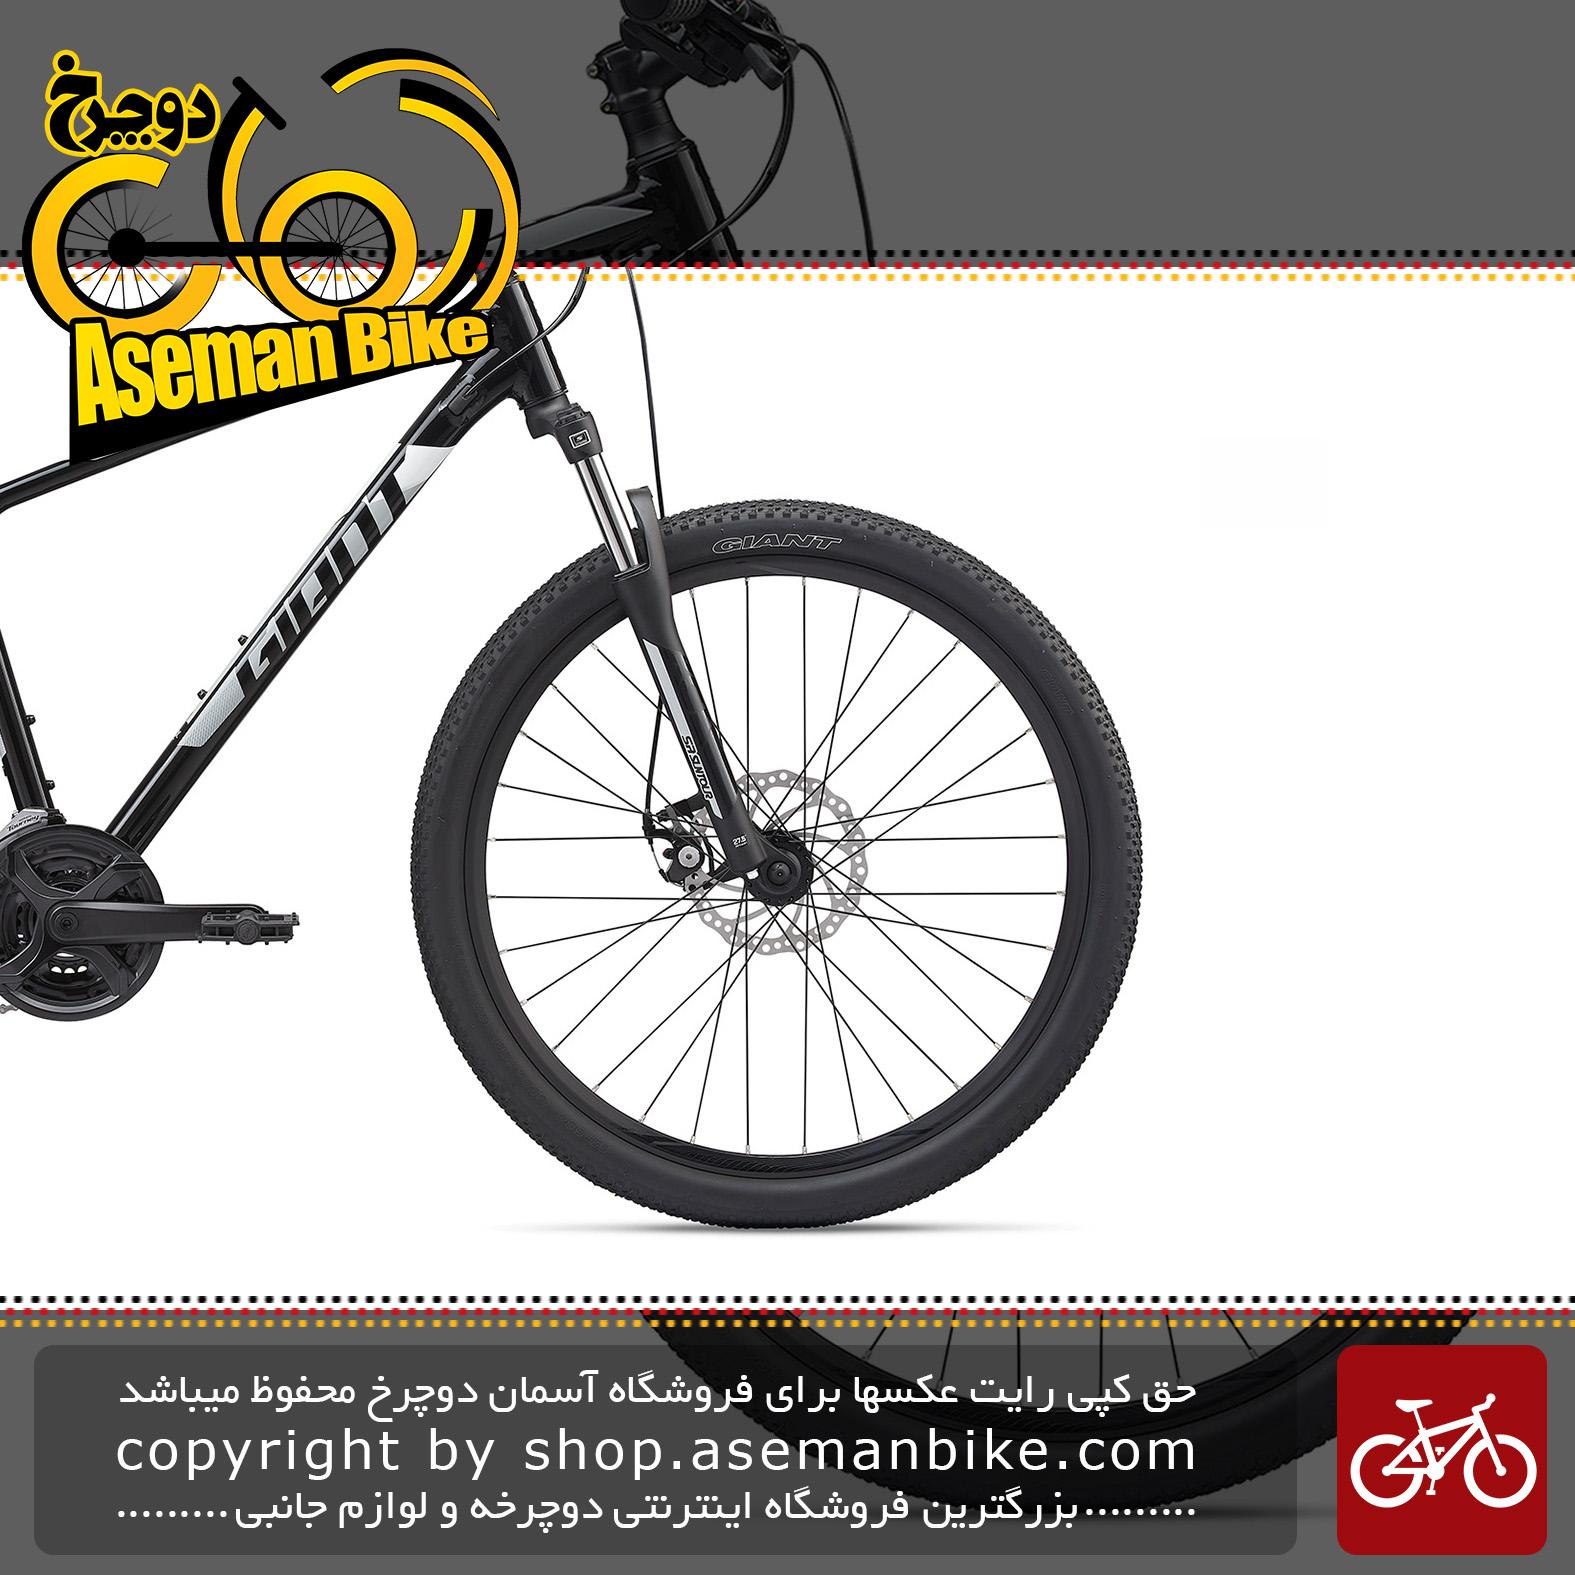 دوچرخه کوهستان جاینت مدل ای تی ایکس 3 دیسک هیدرولیک (جی ای) 2020 Giant Mountain Bicycle ATX 3 Disc (GE) 2020